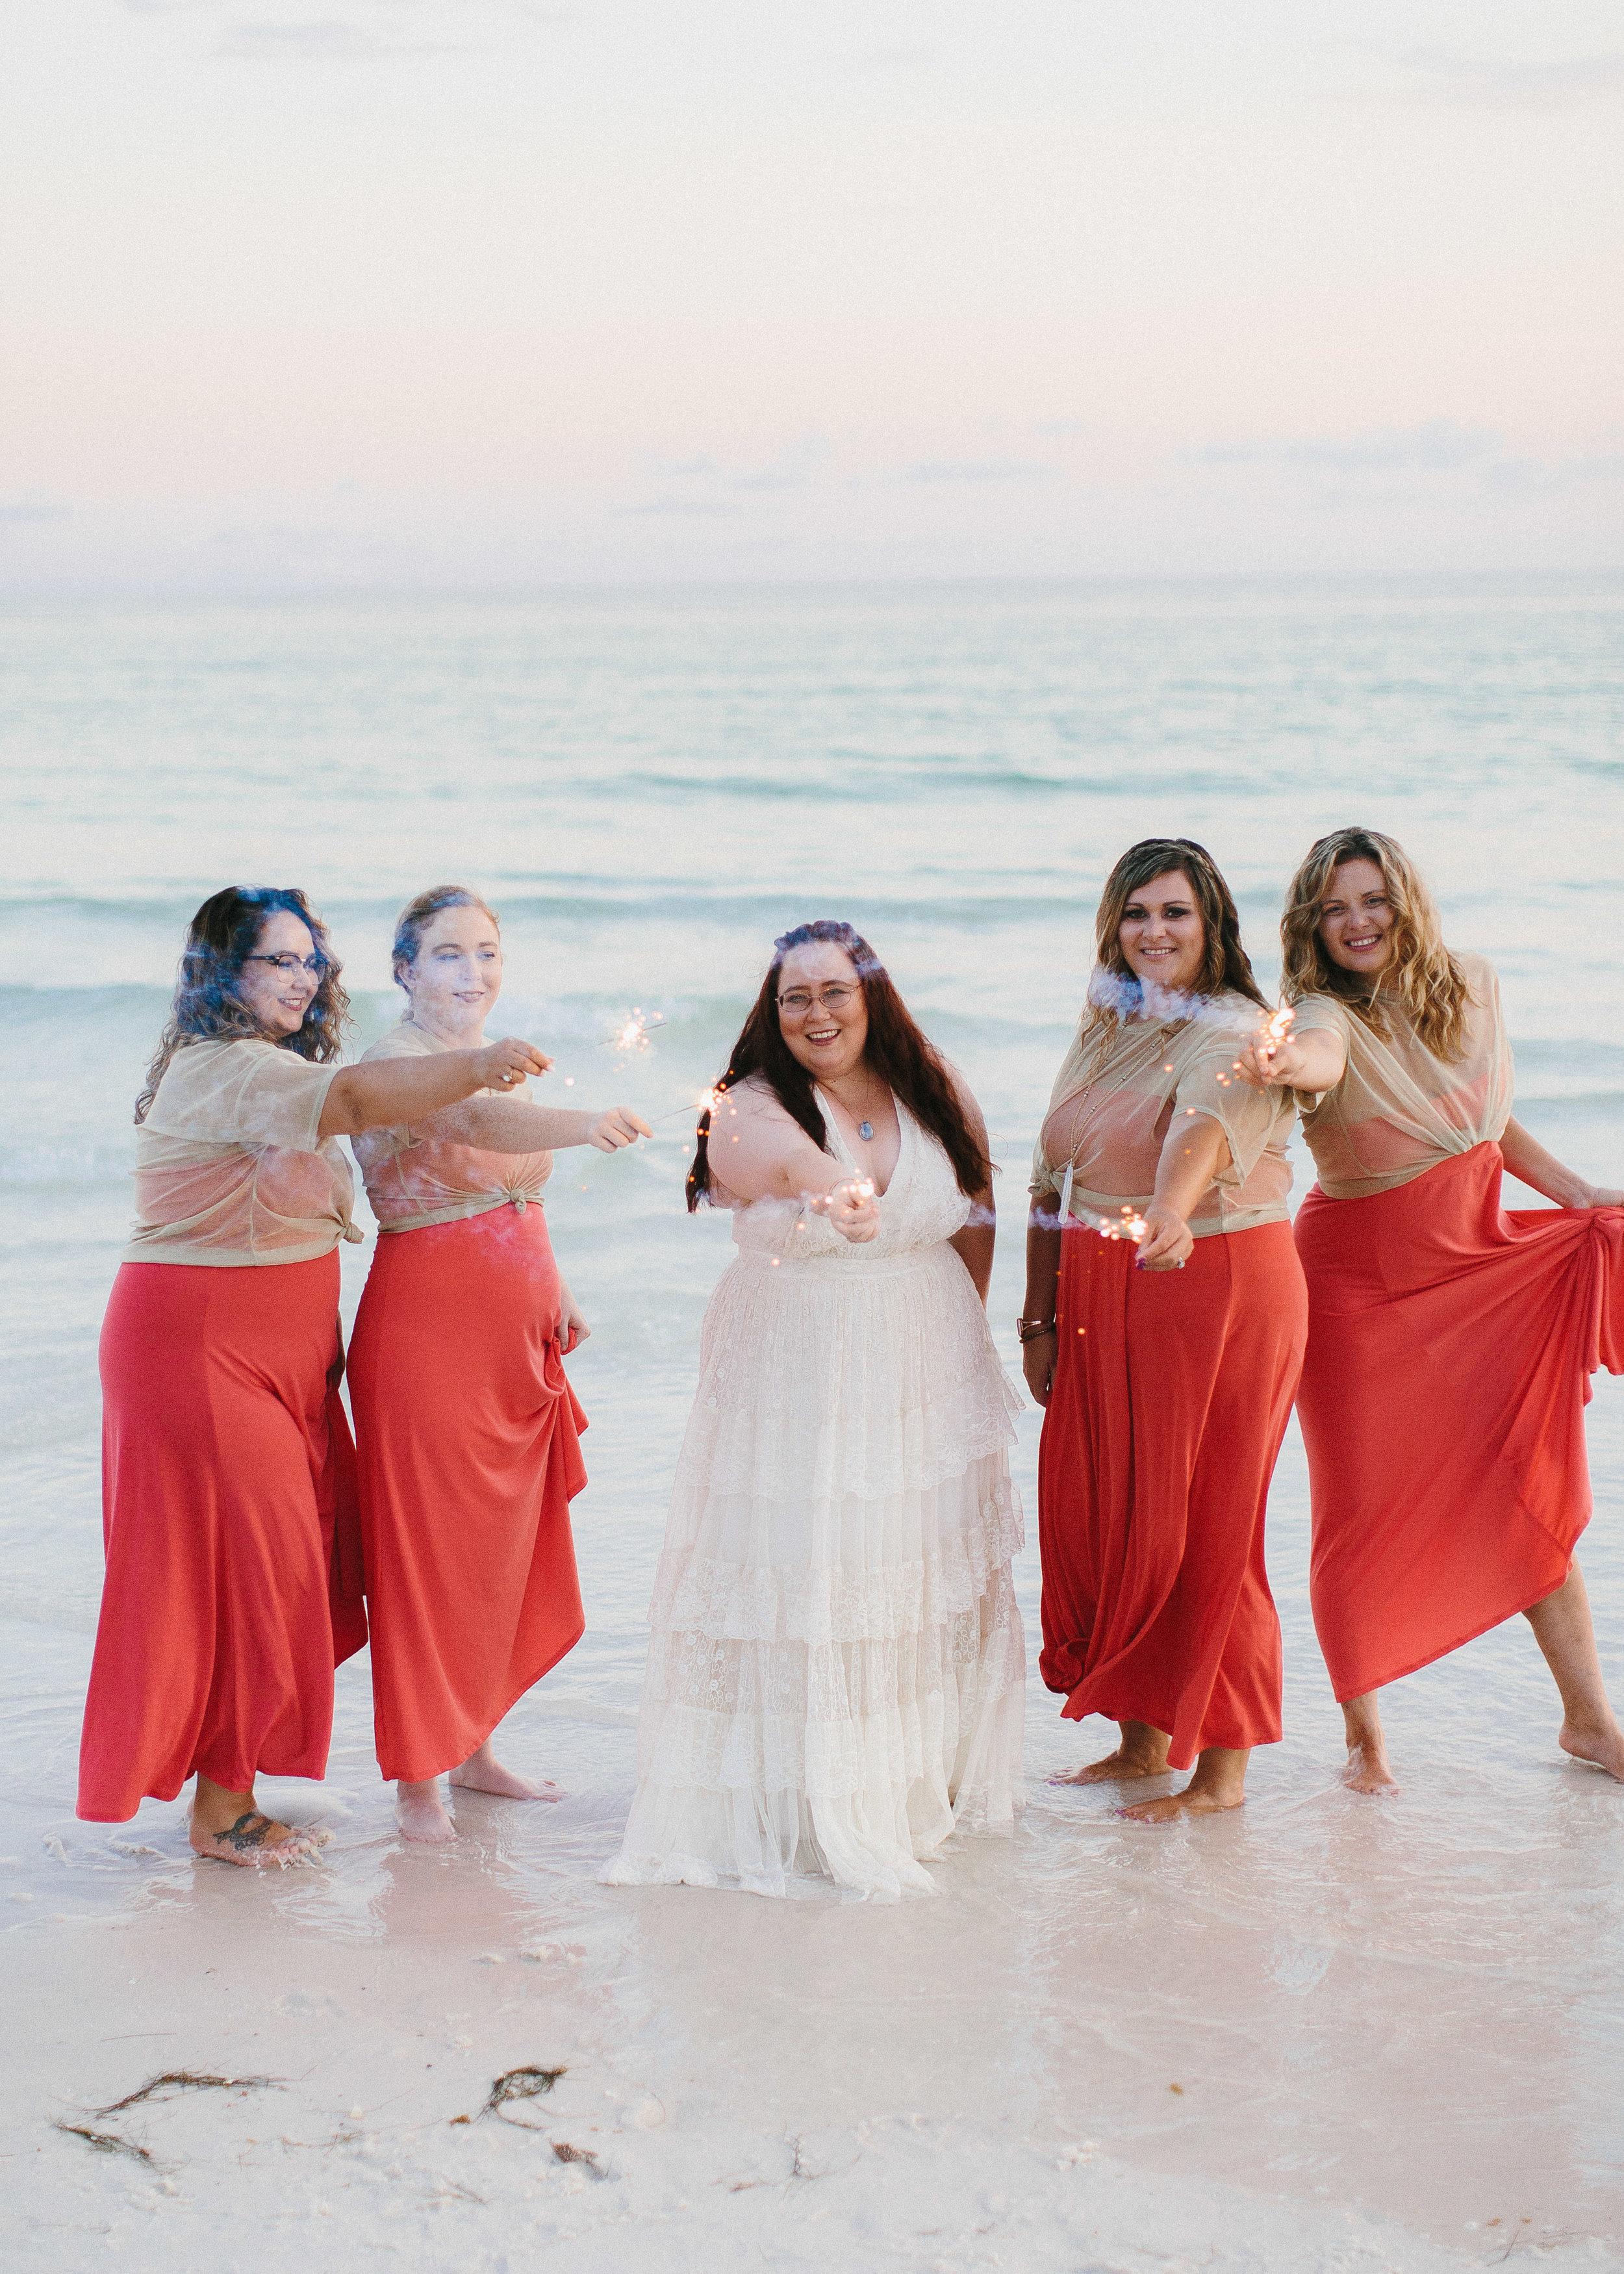 destin_sunset_beach_elopement_intimate_wedding_photographer_florida_documentary_1353.jpg